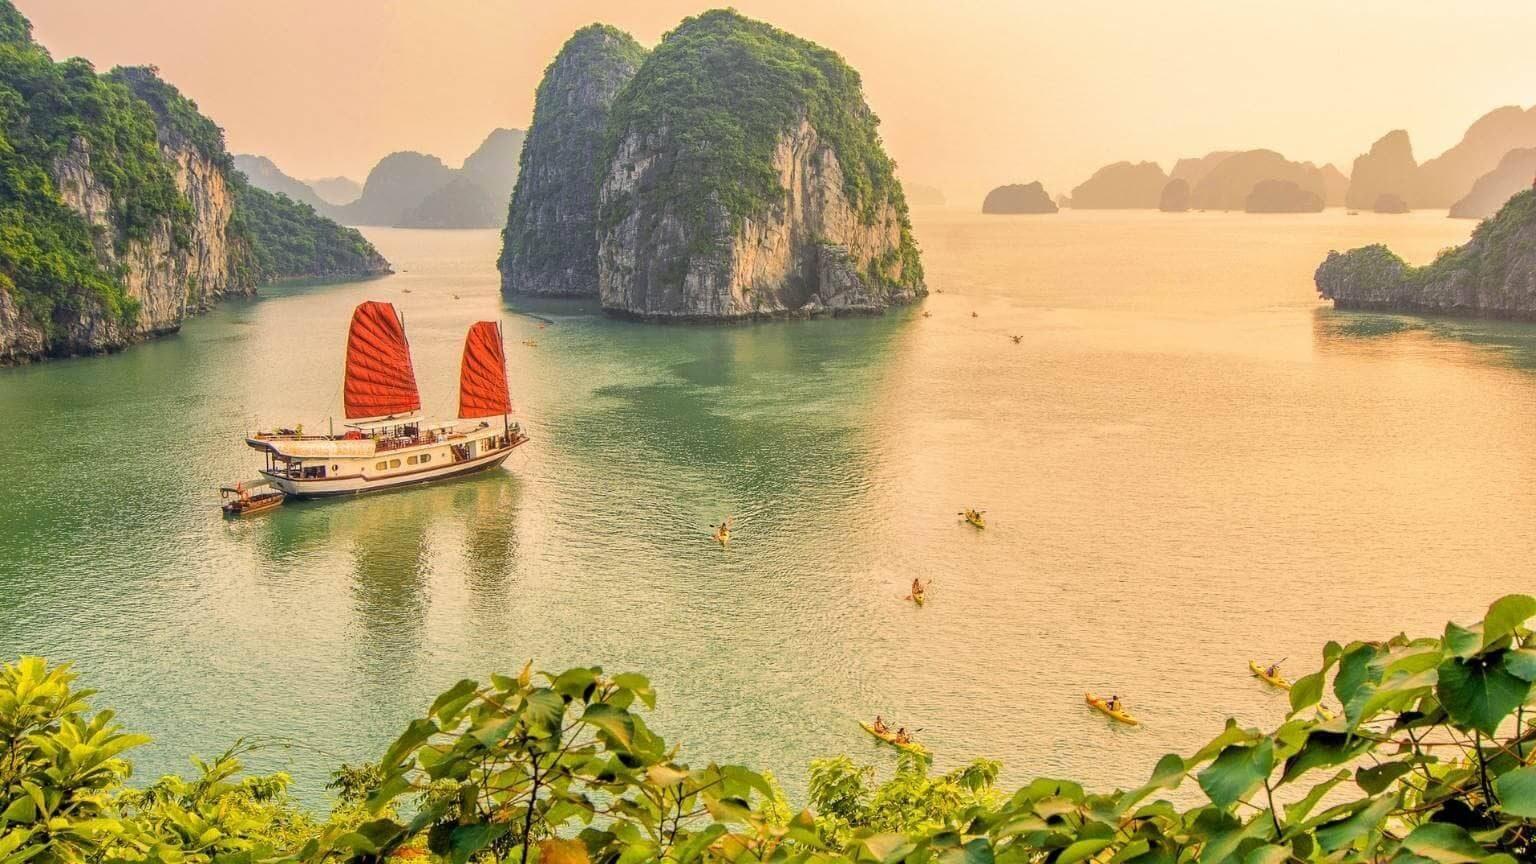 Sunset in Ha Long bay Vietnam